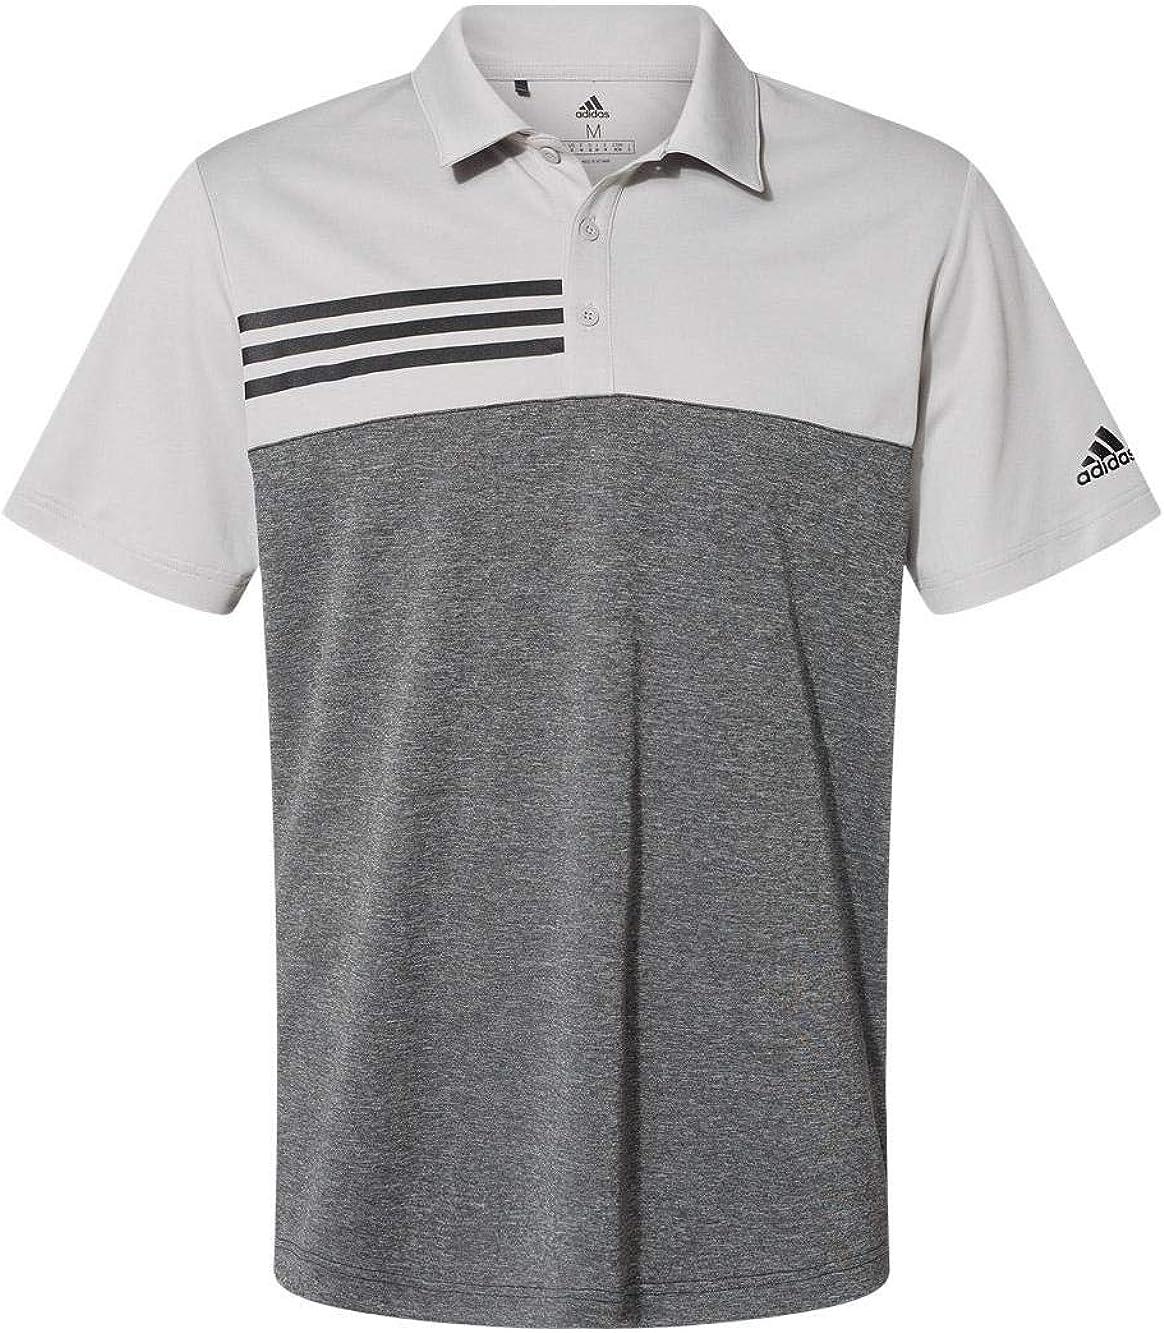 adidas - Heathered Colorblock 3-Stripes 25% OFF A508 Shirt Japan Maker New L Sport